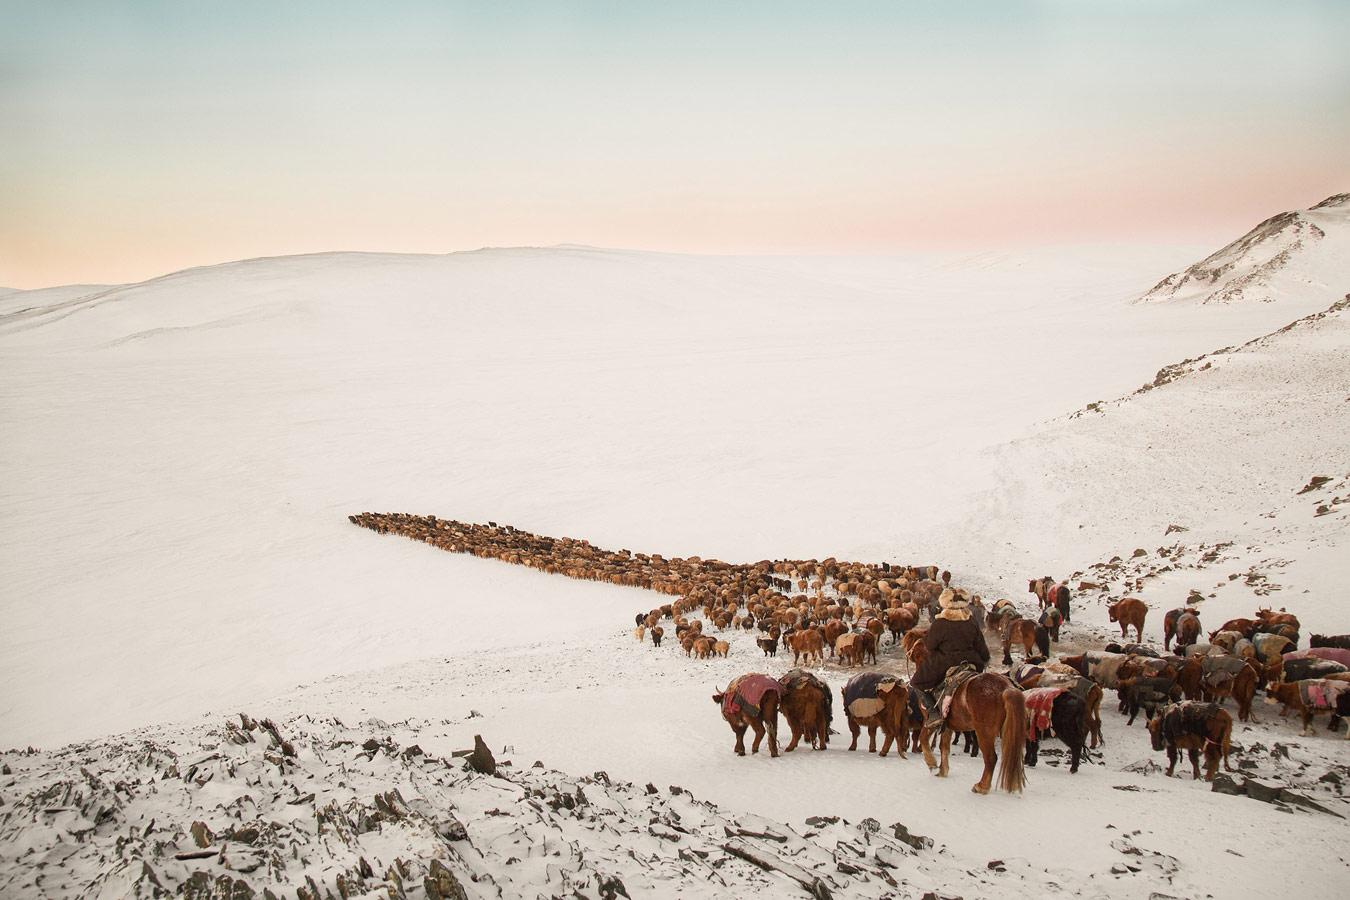 Тема: Документальное, июнь 2018 года, © Алессандра Манзотти, Фотоконкурс «Независимый фотограф» — The Independent Photographer